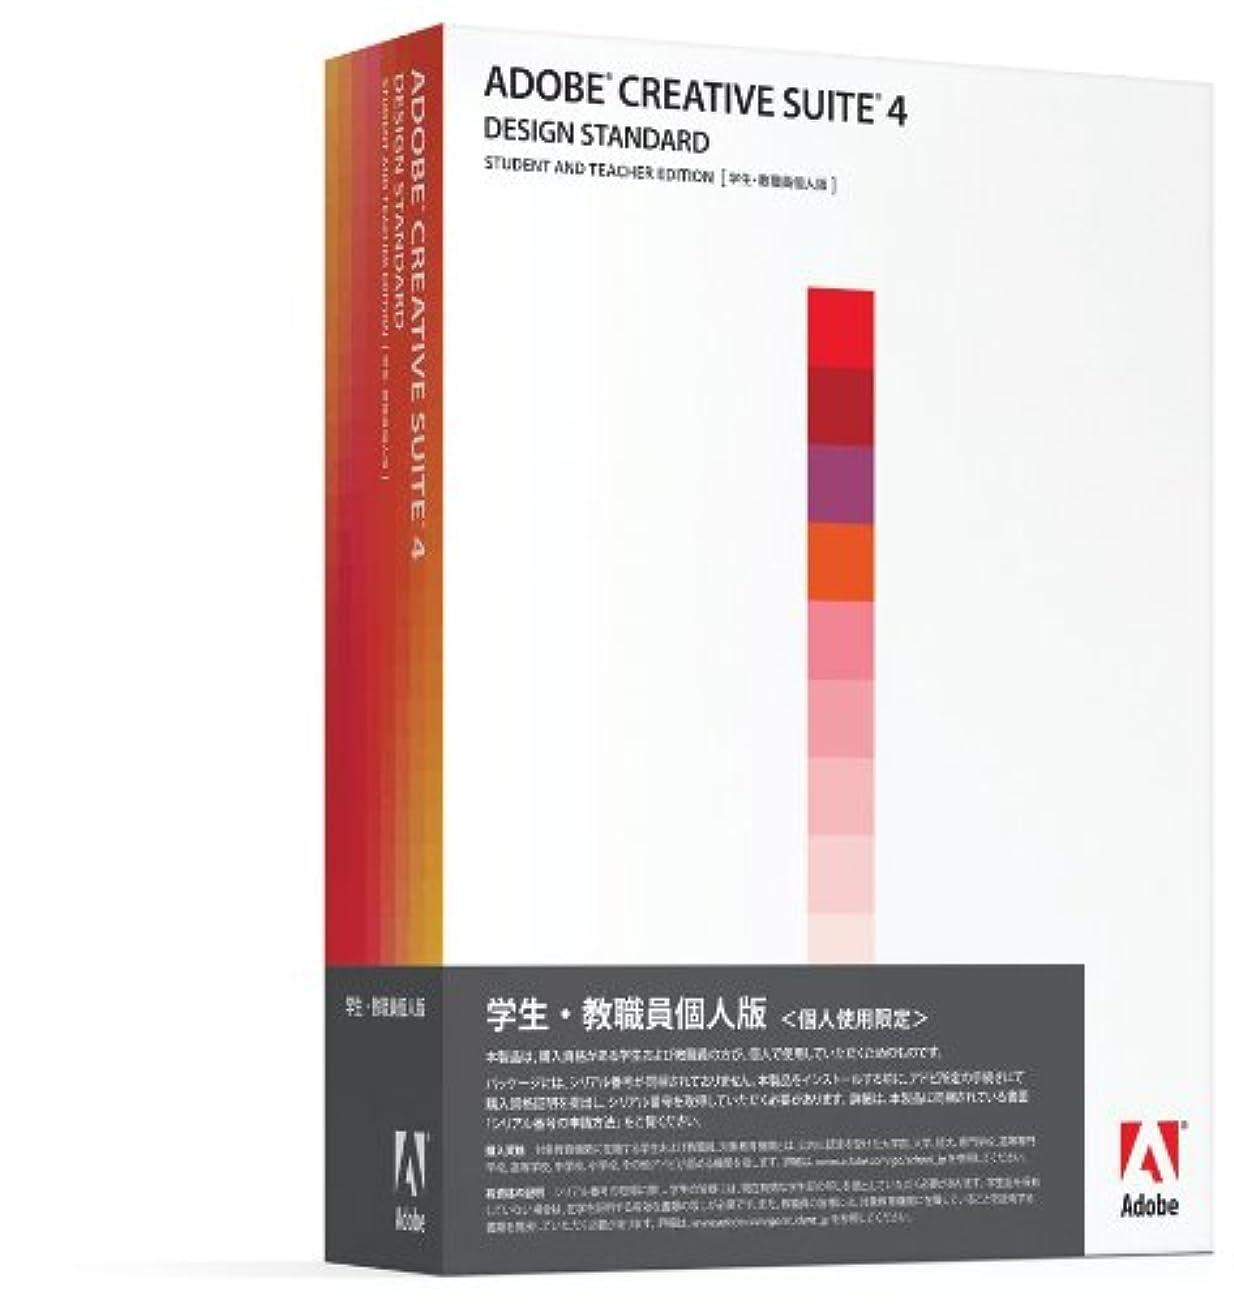 ブースト嵐名義で学生?教職員個人版 Adobe Creative Suite 4 日本語版 Design Standard Windows版 (要シリアル番号申請)